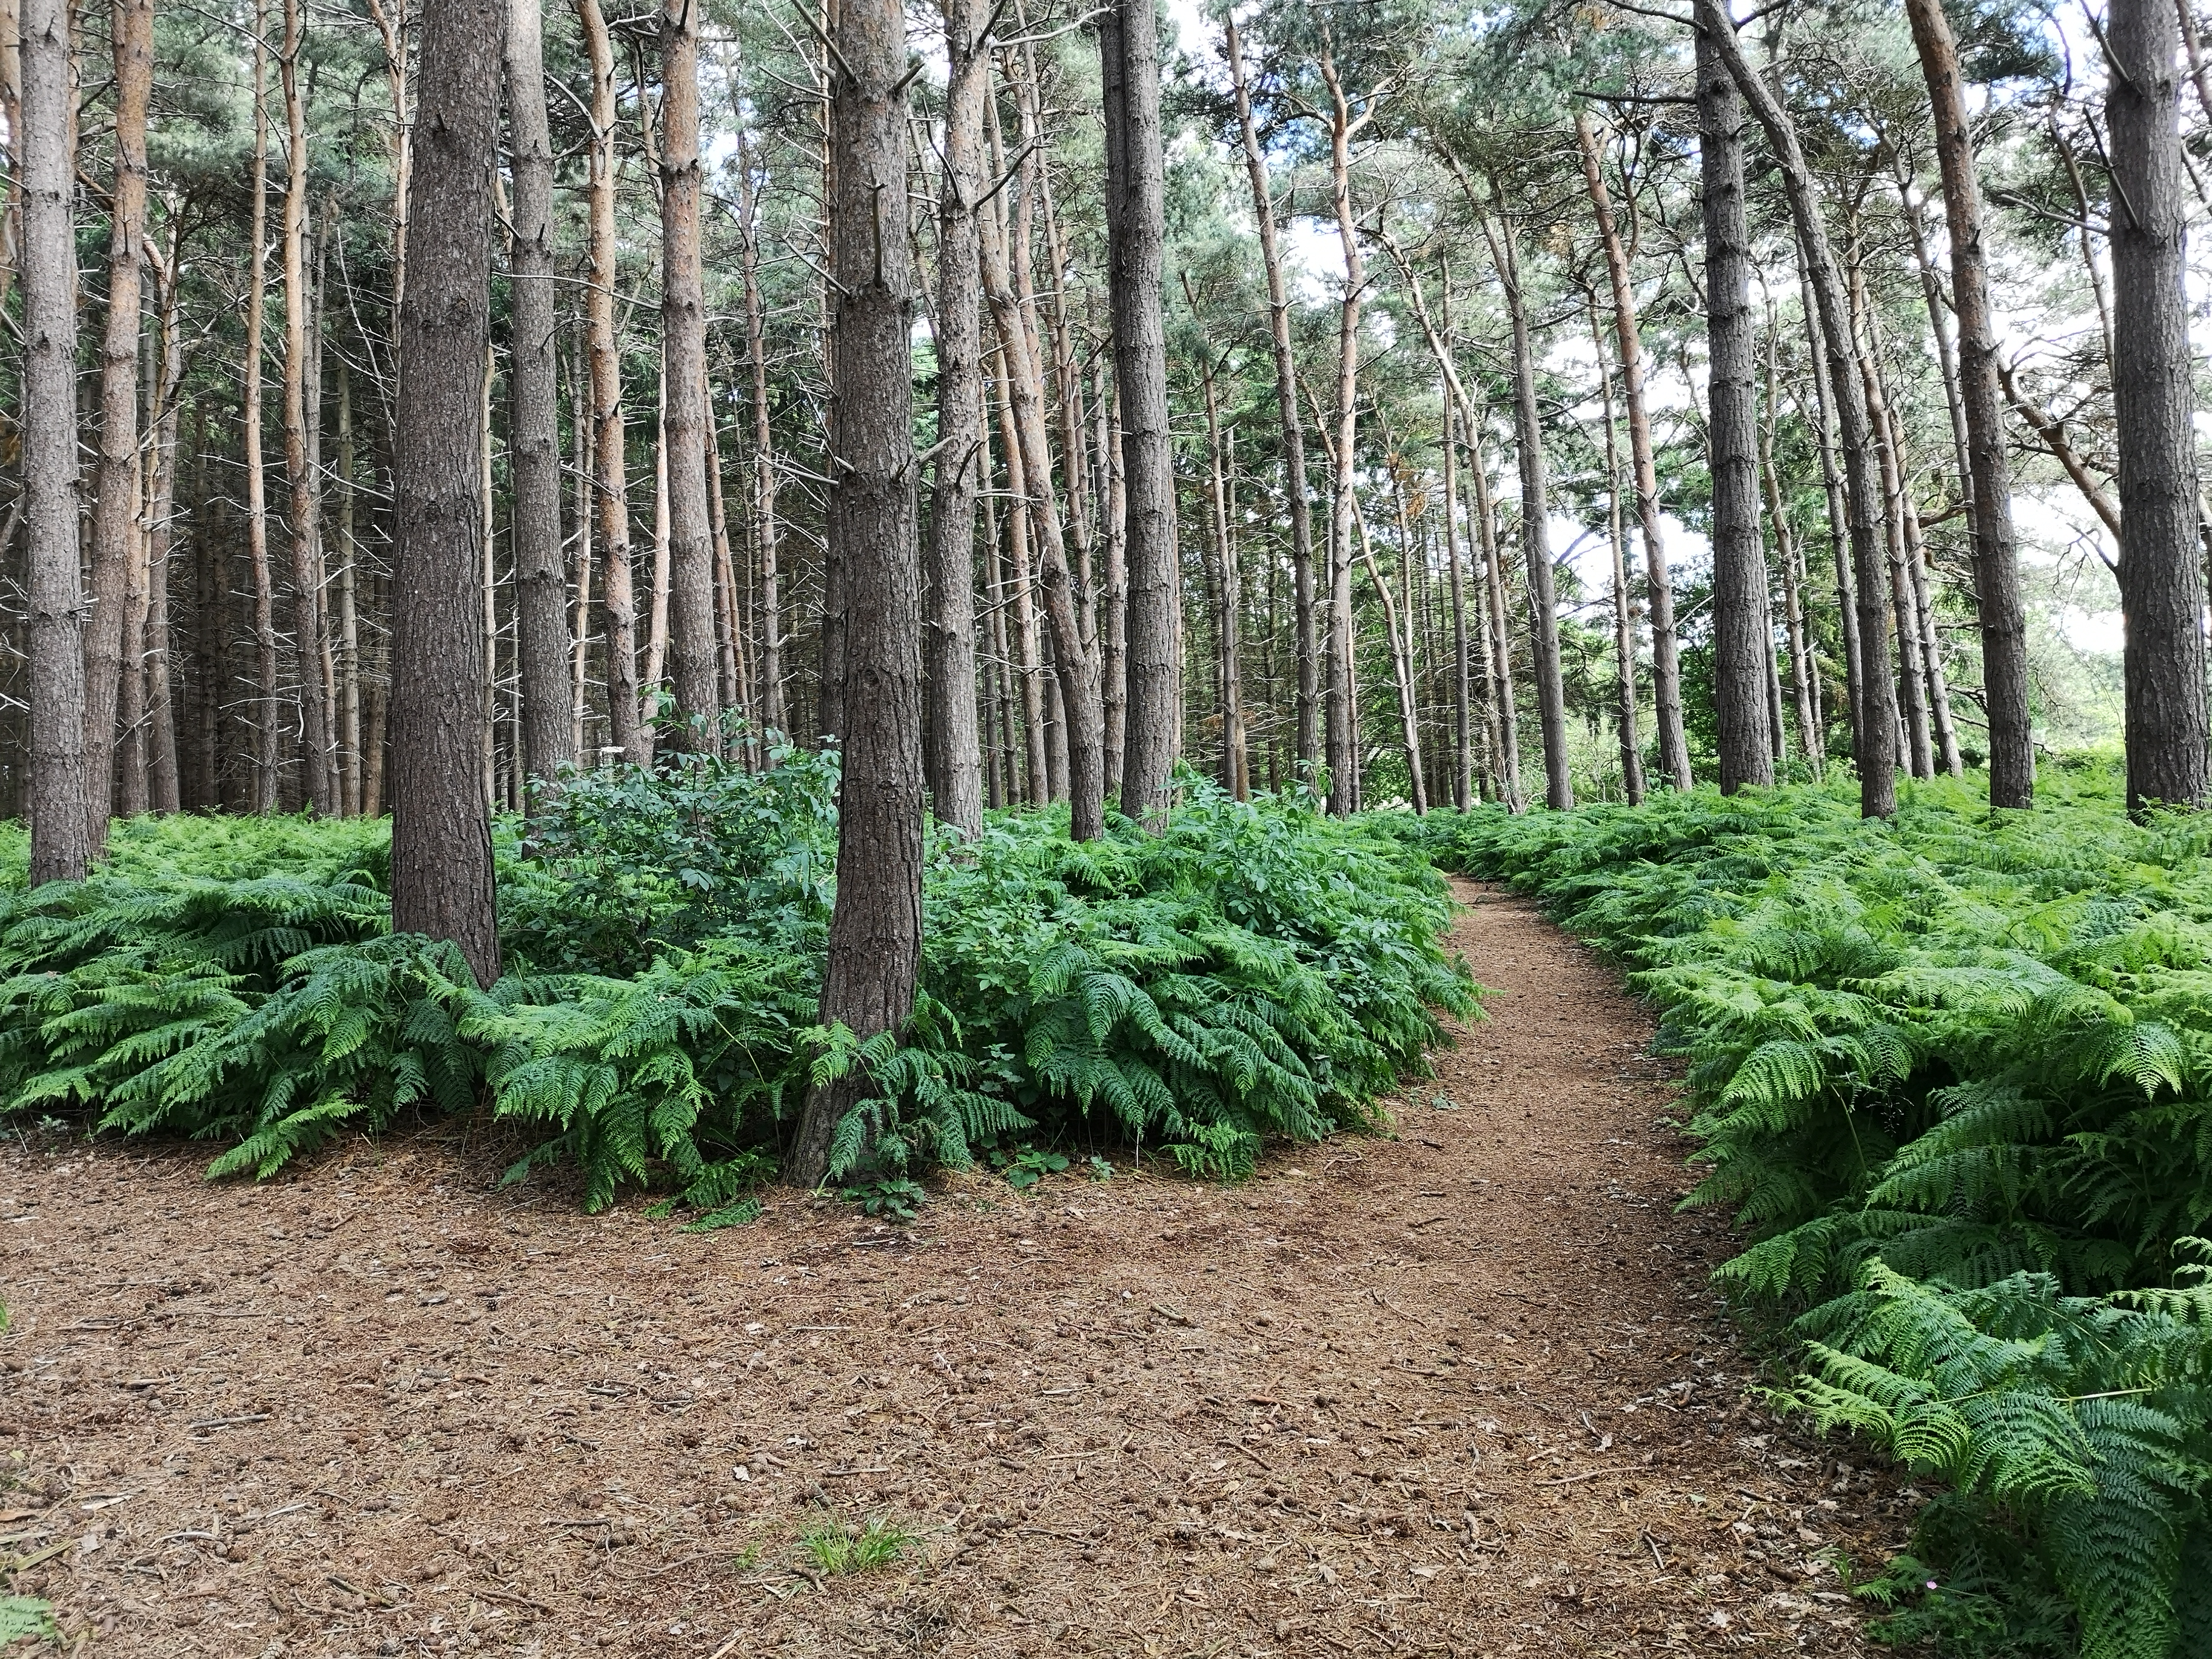 Potterhanworth and Burnt Woods Woodland Walk